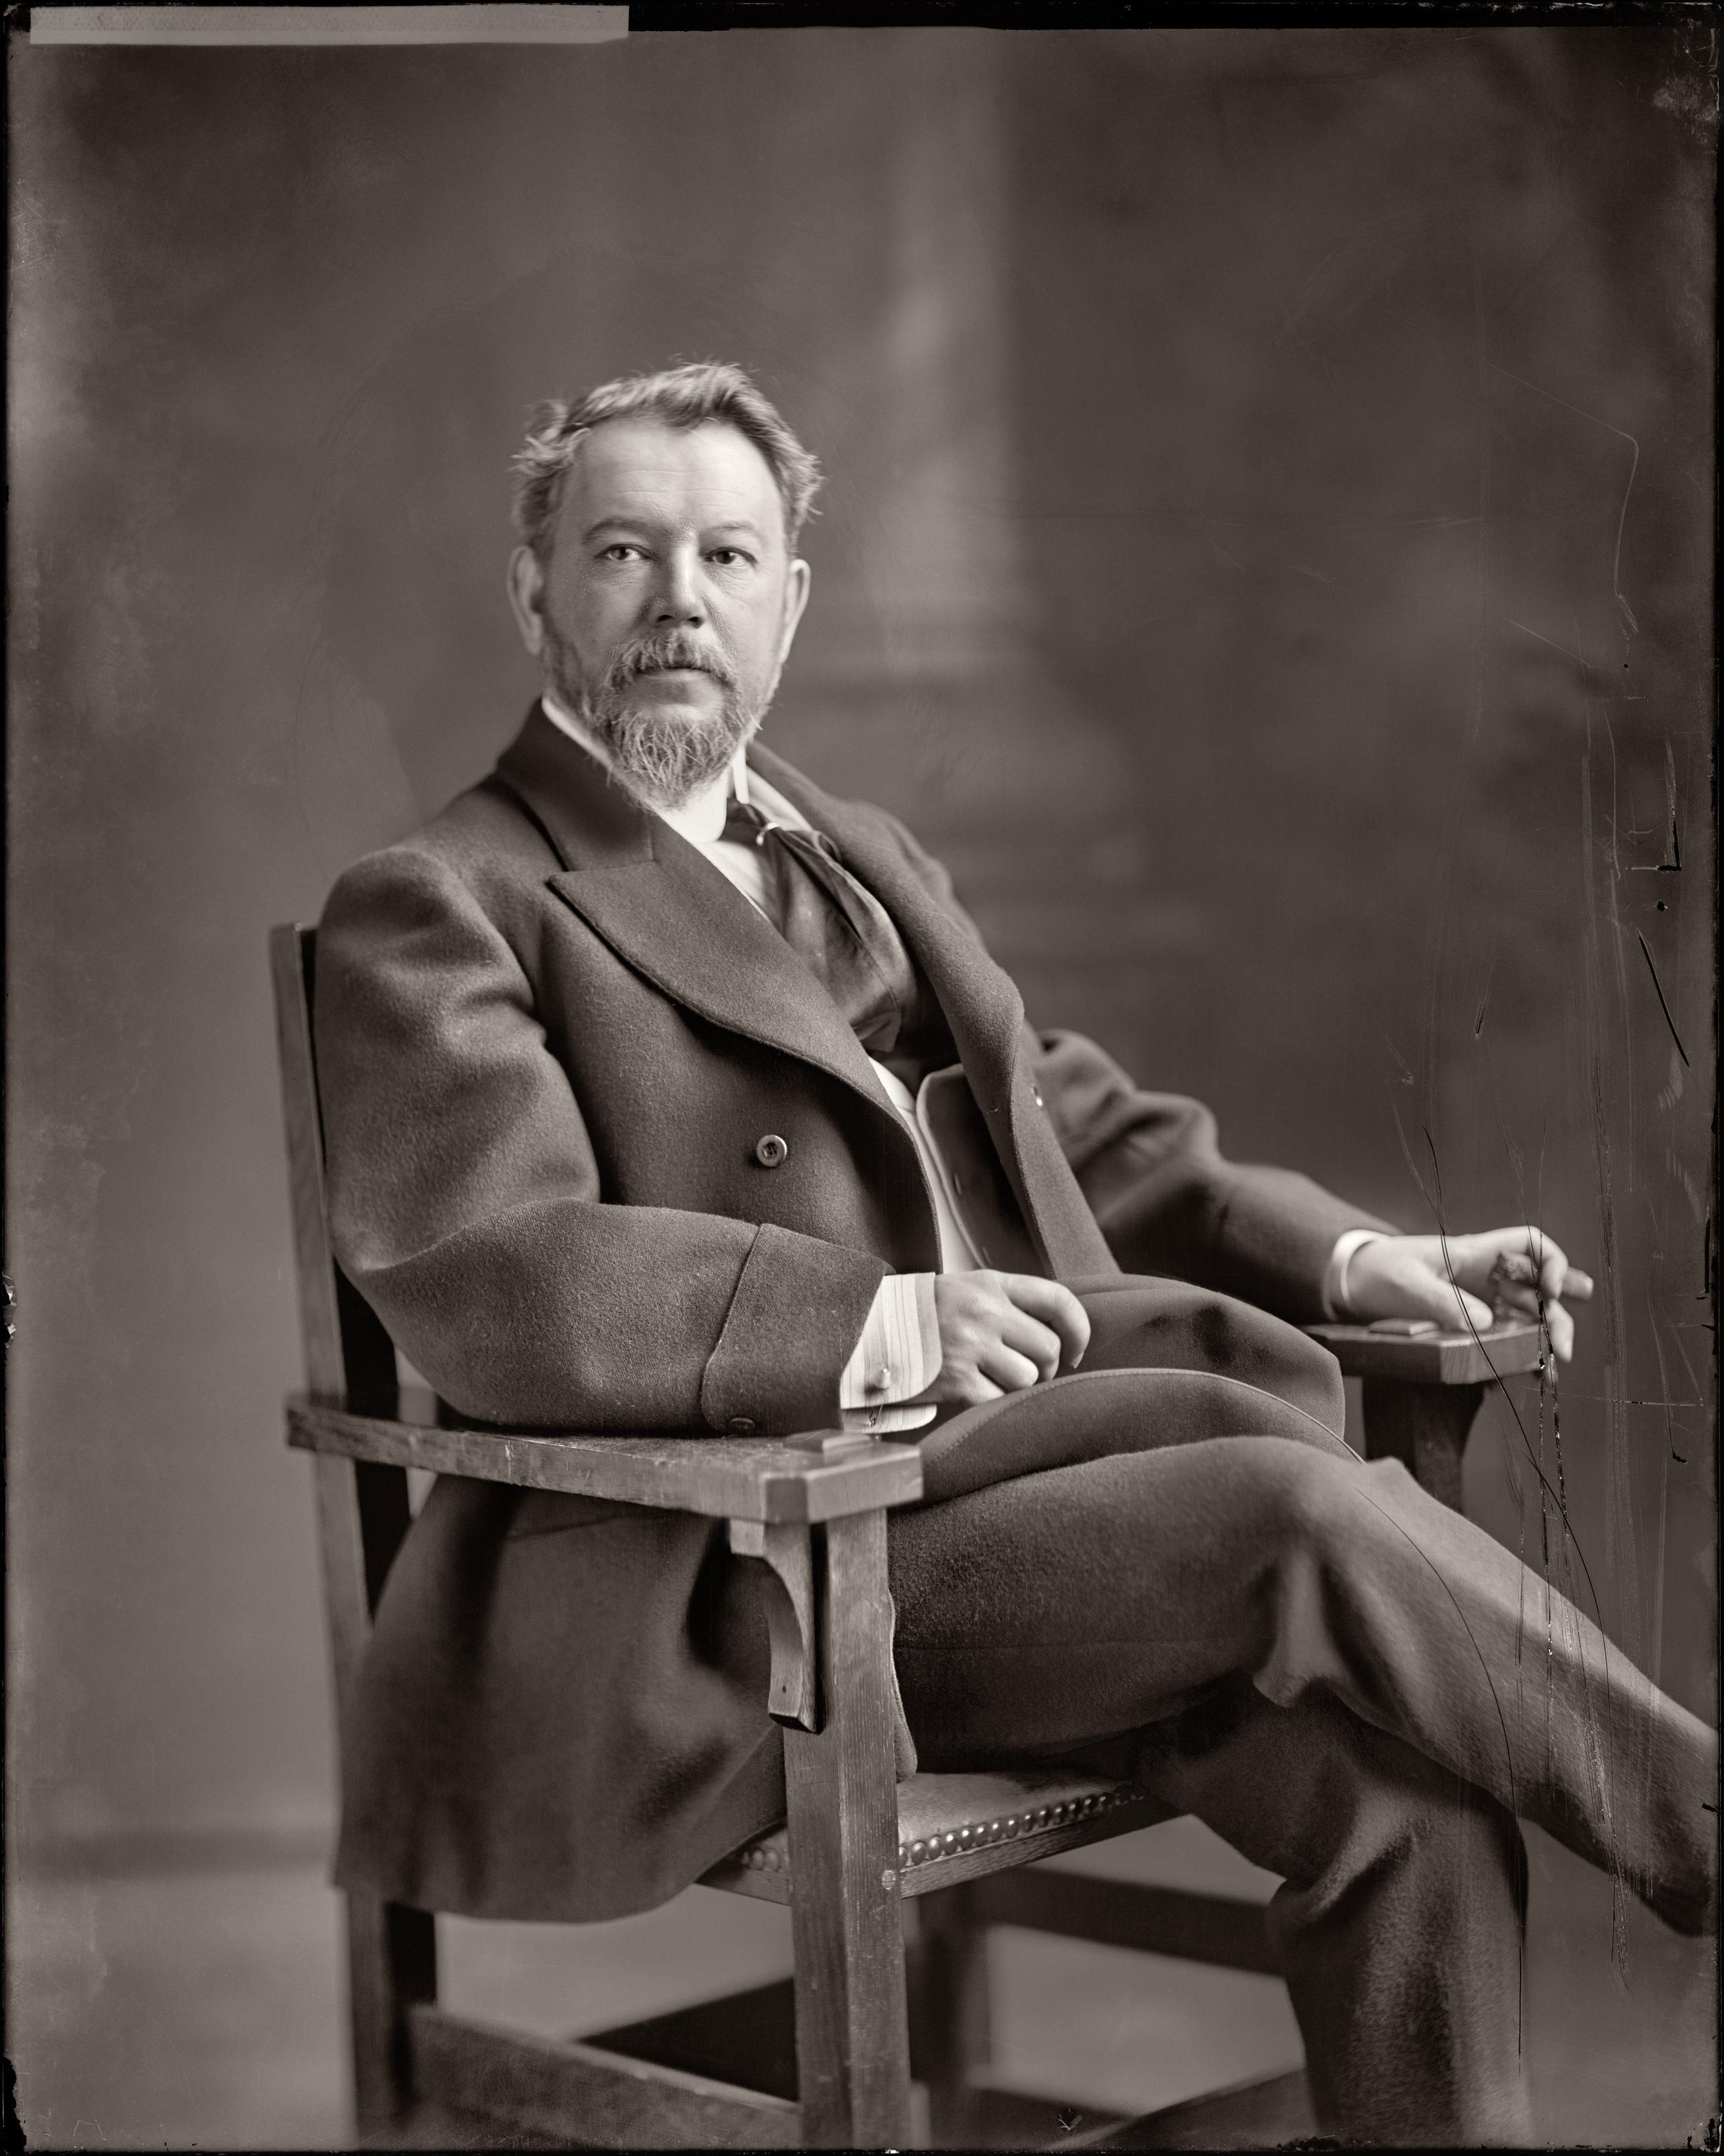 Retrato Sorolla-1905circa-Harris & Ewing photographer-EEUU-16284u NIV RET IMP.jpg